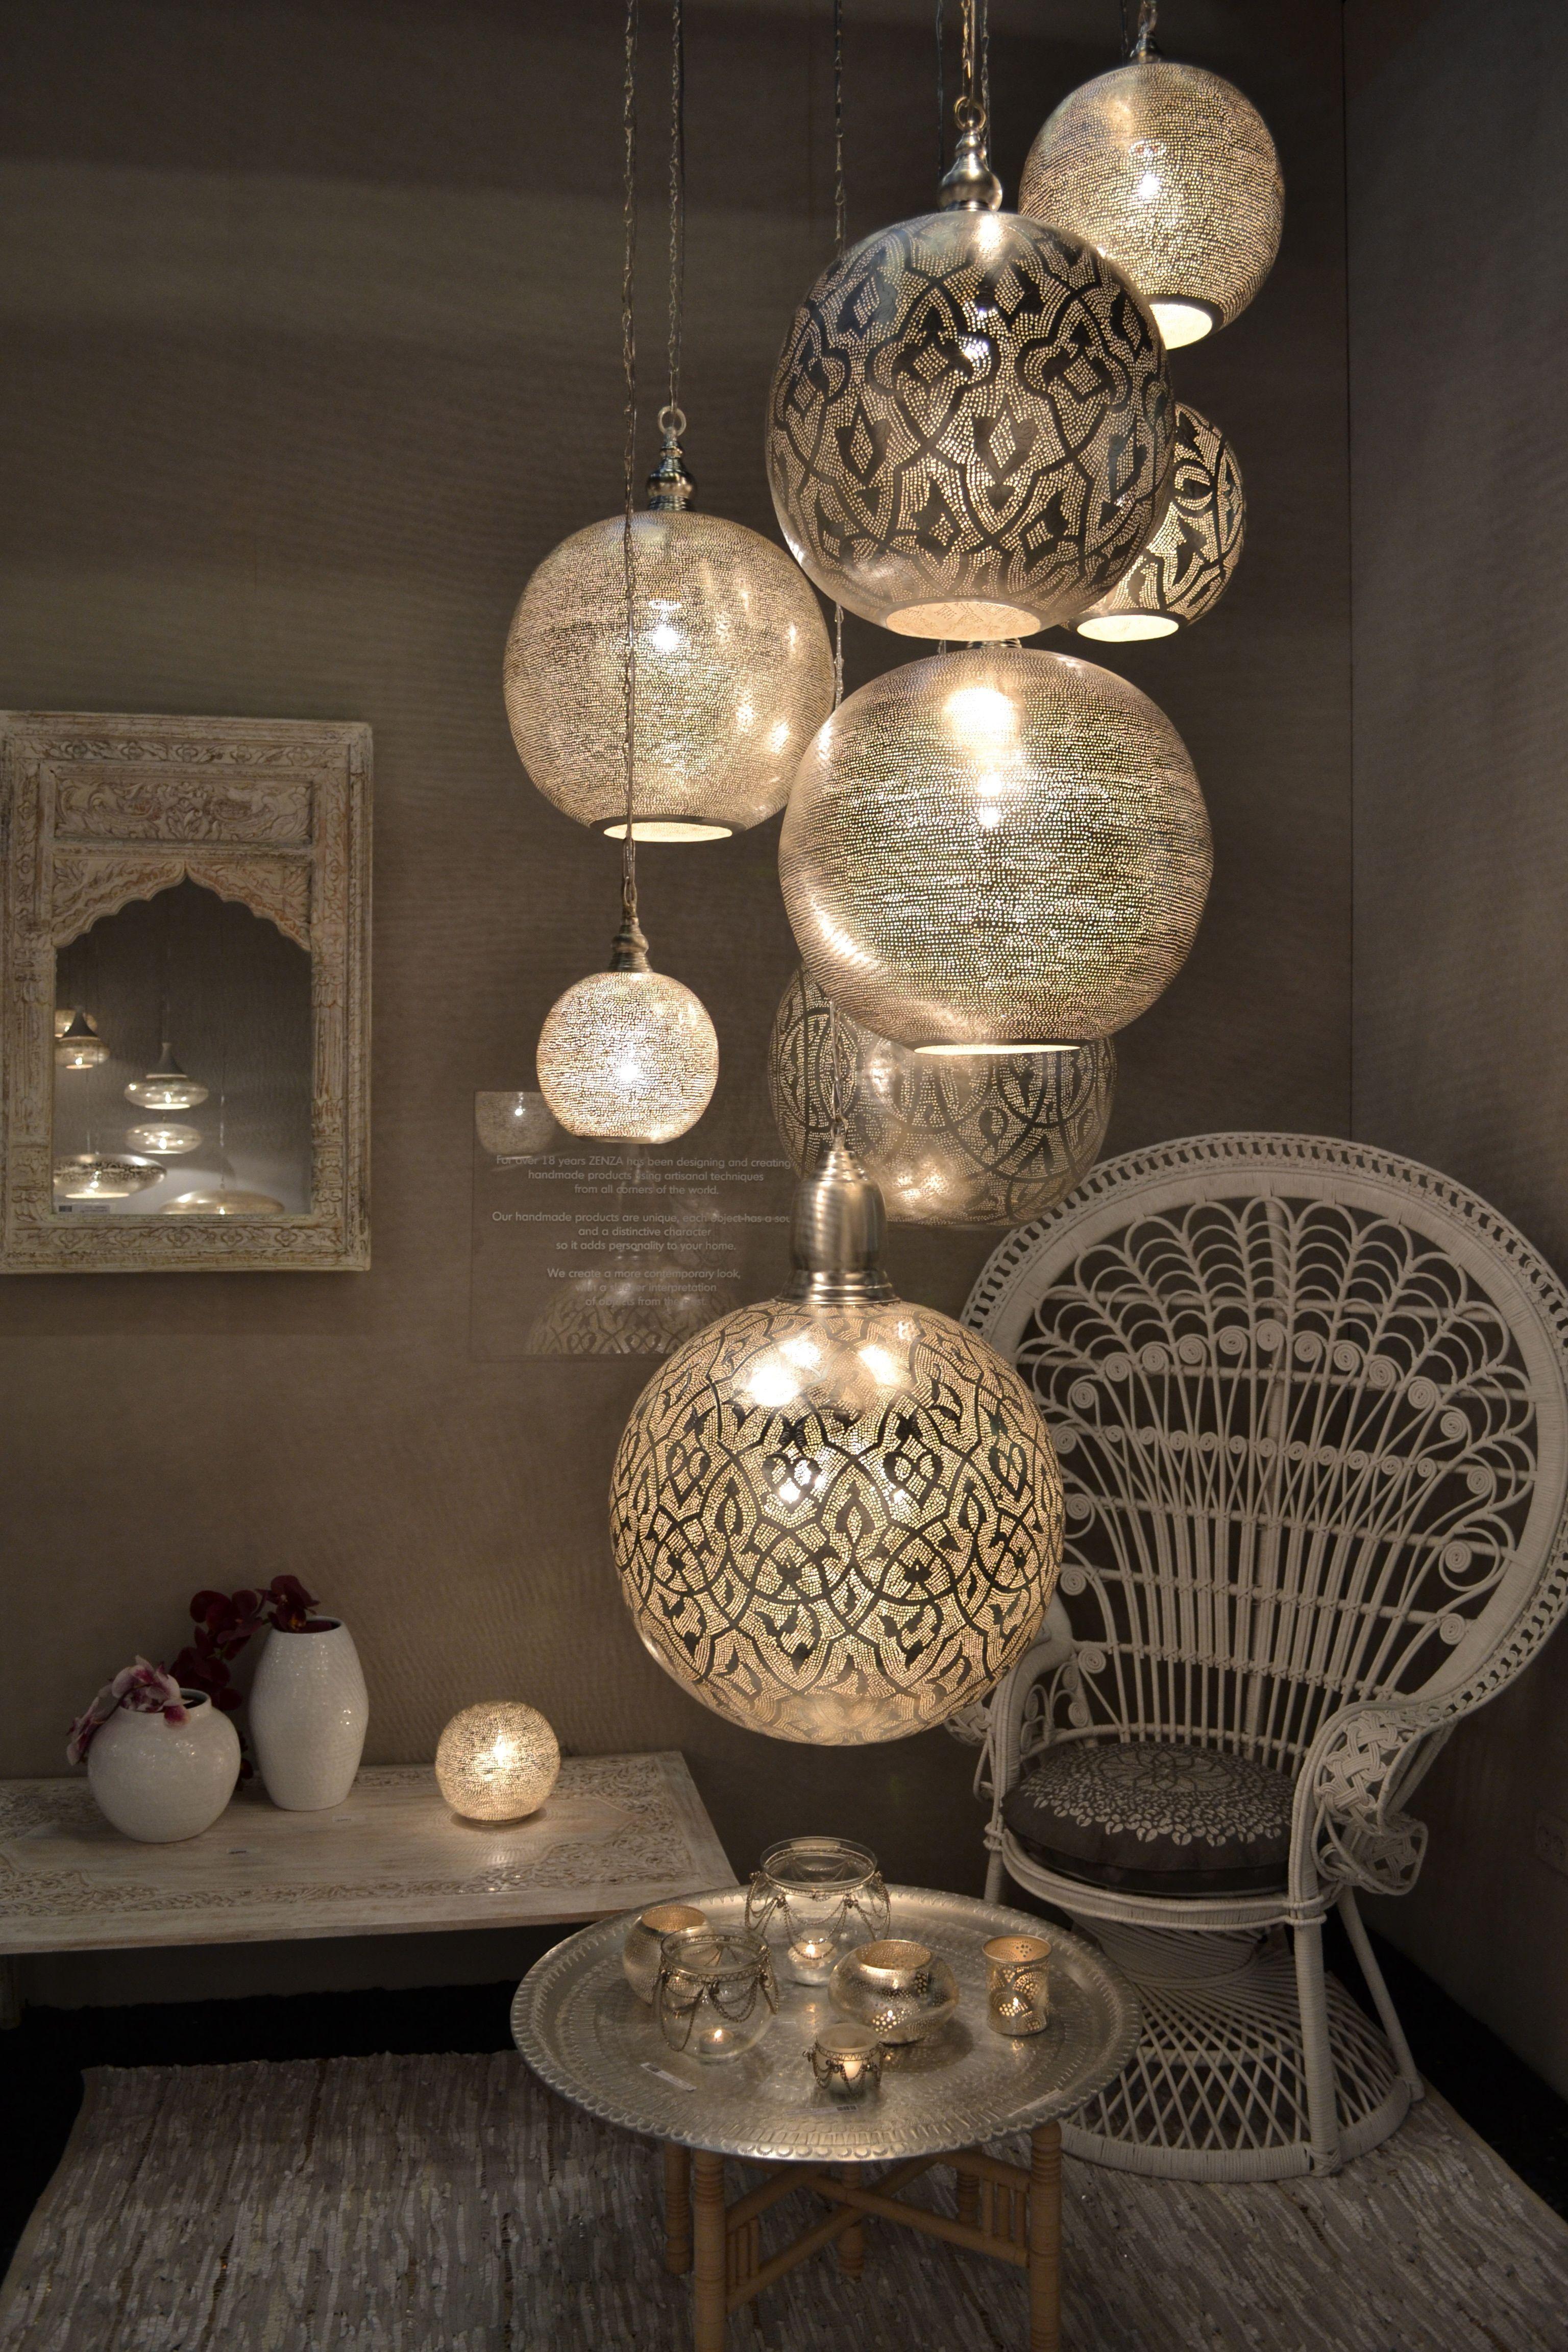 Majestic 50 Best Asian Decor Idea Https Decoratio Co 2017 04 50 Best Asian Decor Idea Some Tips For Decorating D Asian Home Decor Asian Decor Moroccan Decor